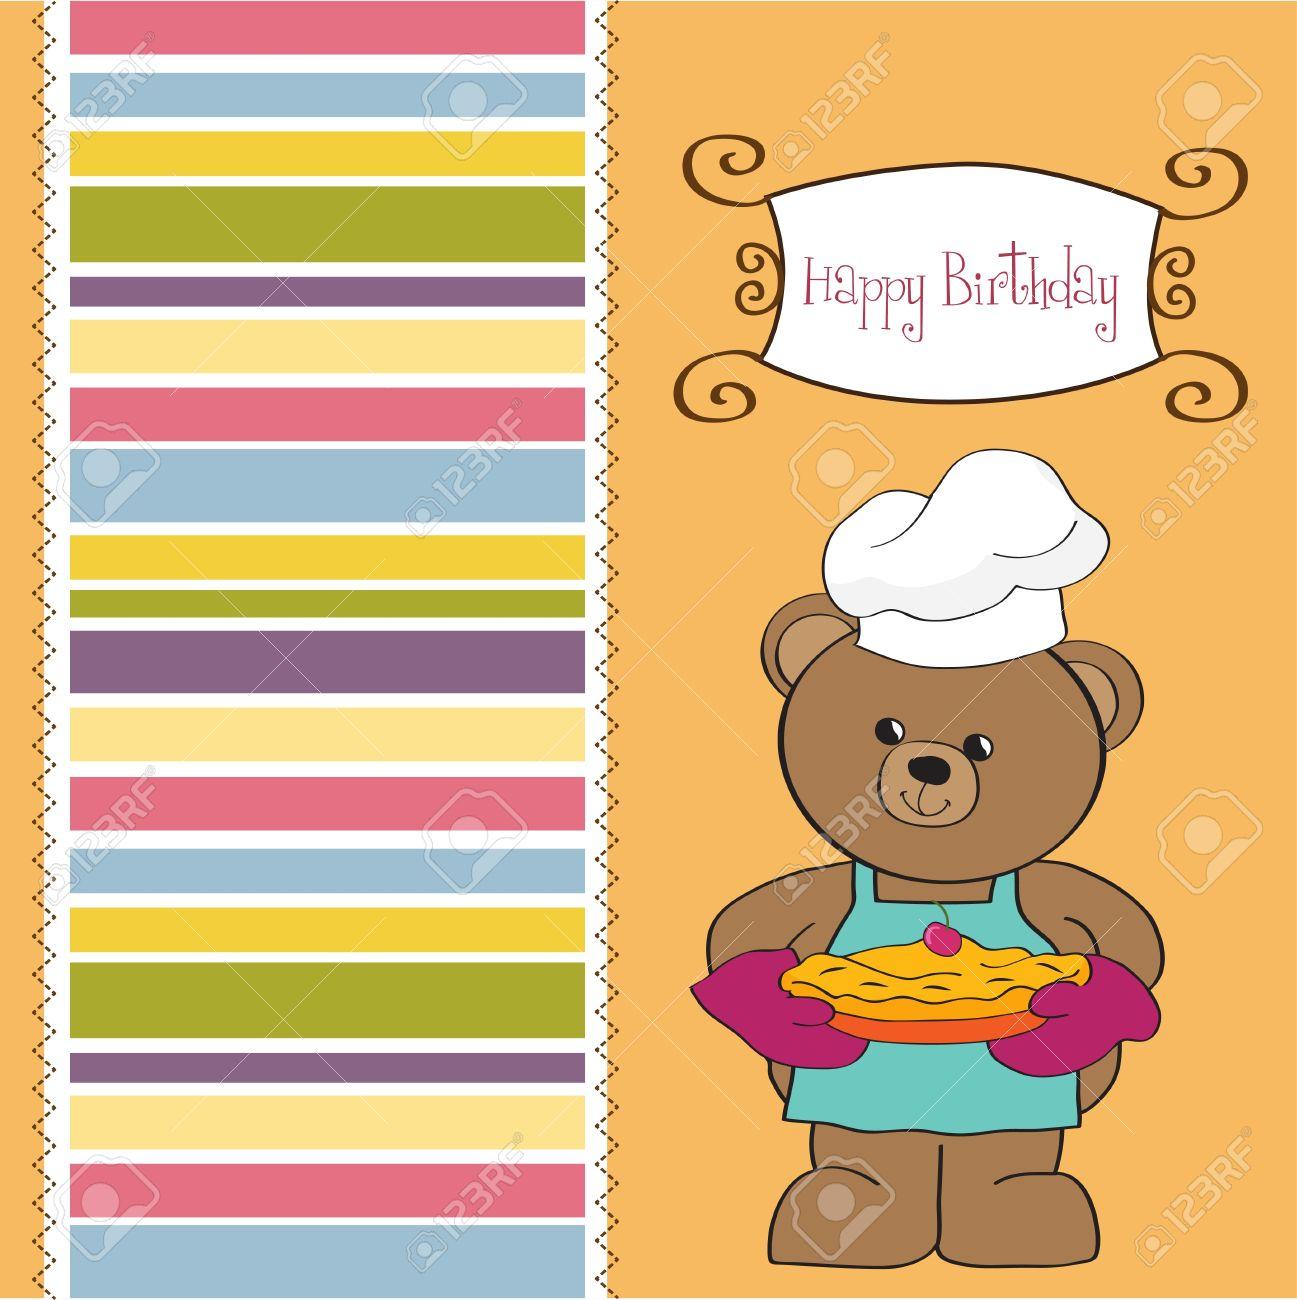 teddy bear with pie  birthday greeting card Stock Vector - 12748856